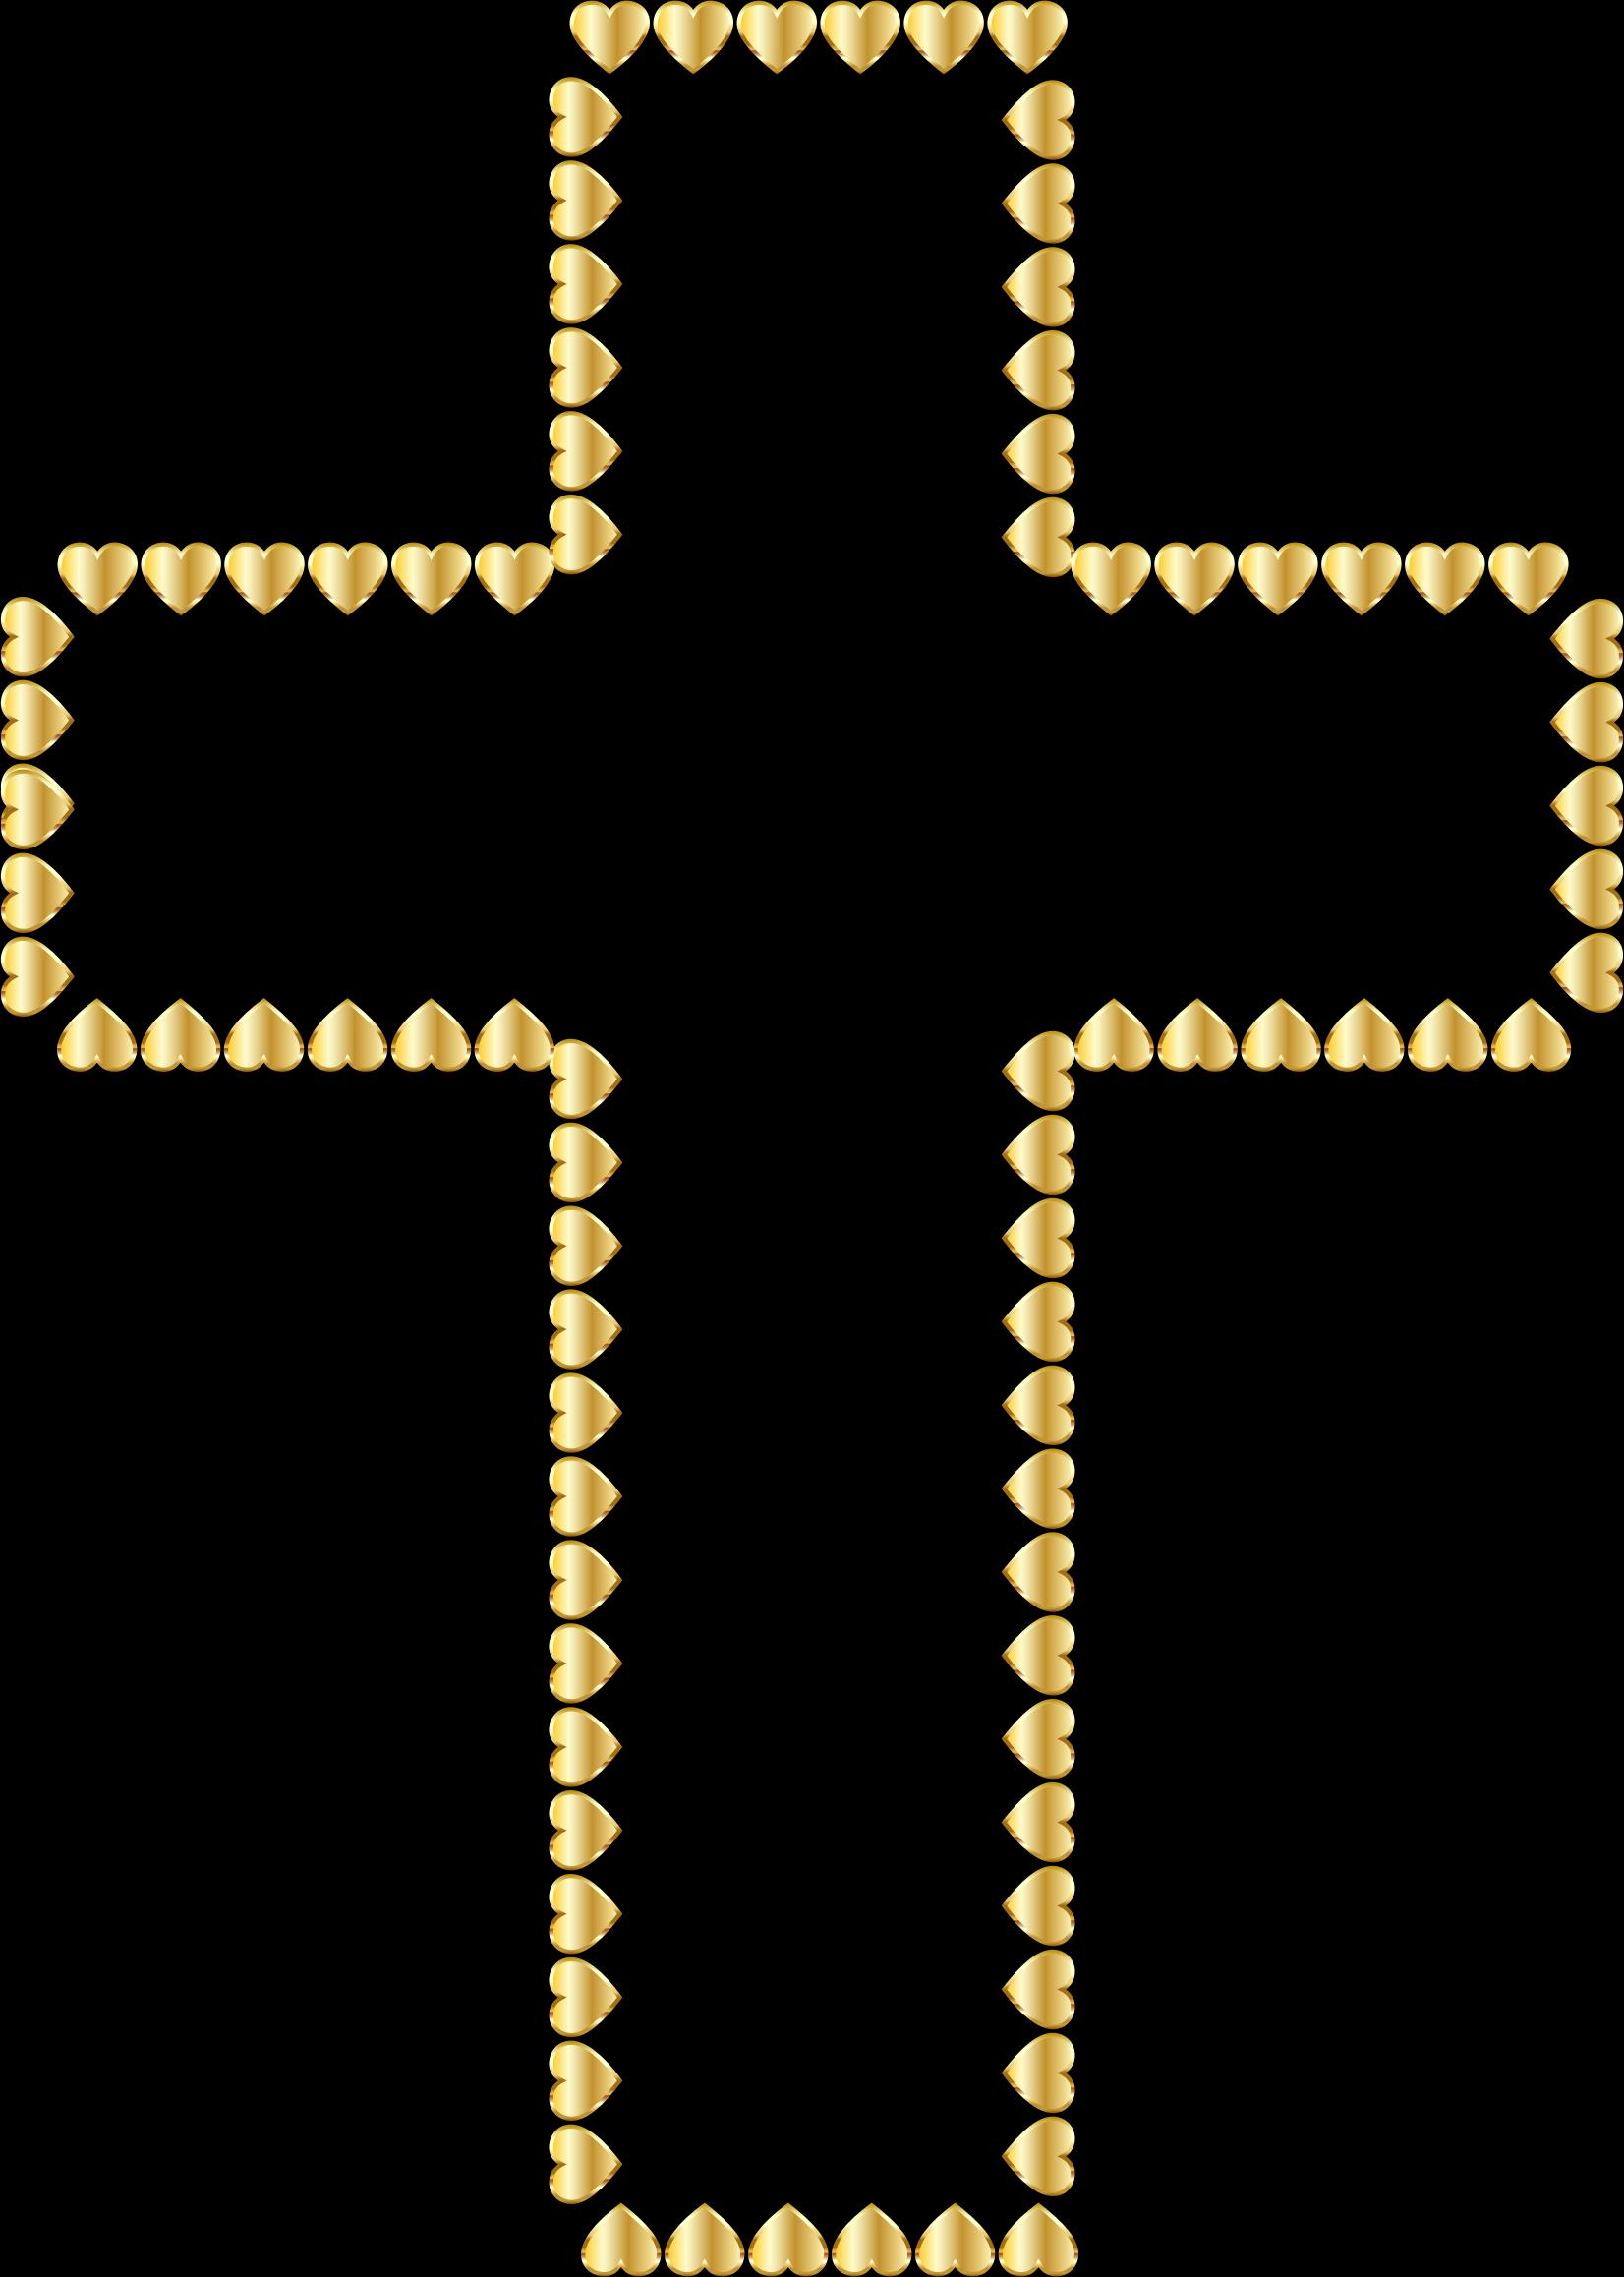 Cross clipart baptism. Golden hearts no background